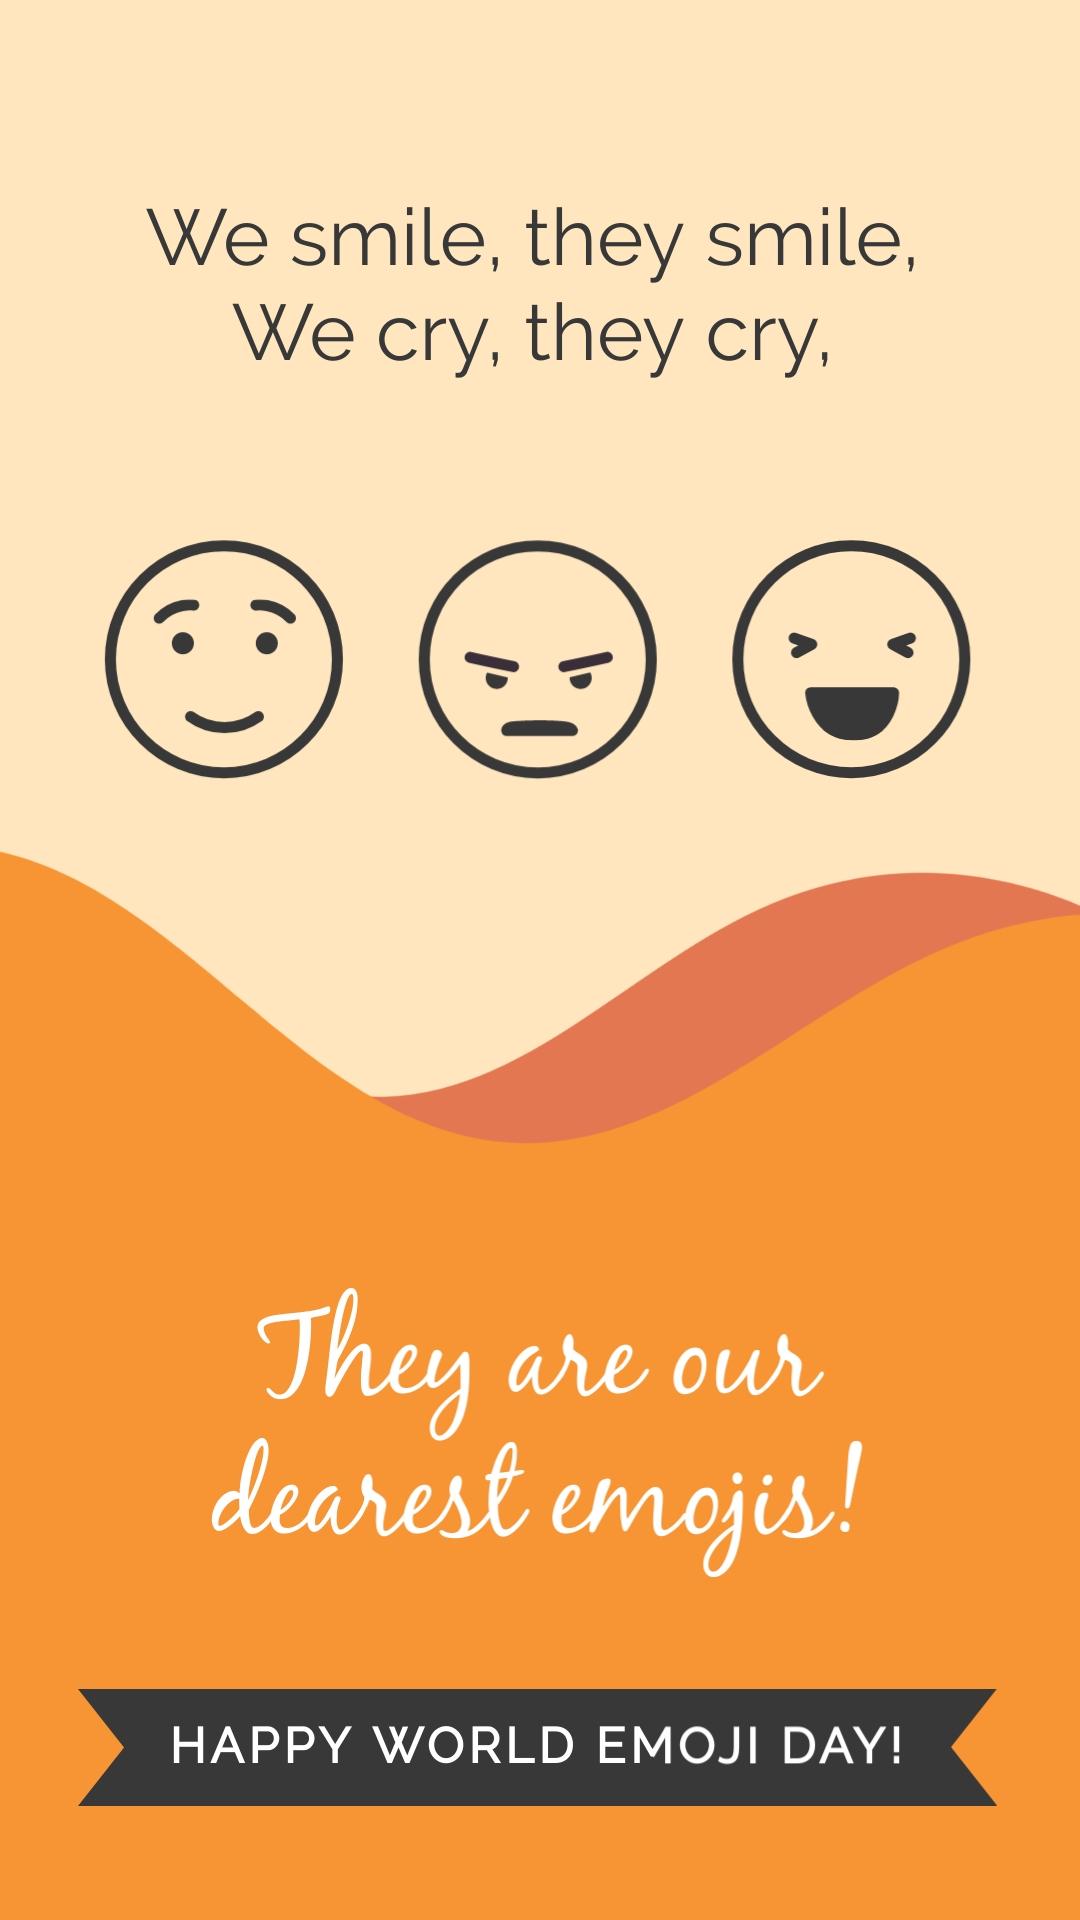 We Smile Emoji Animated Vertical Template